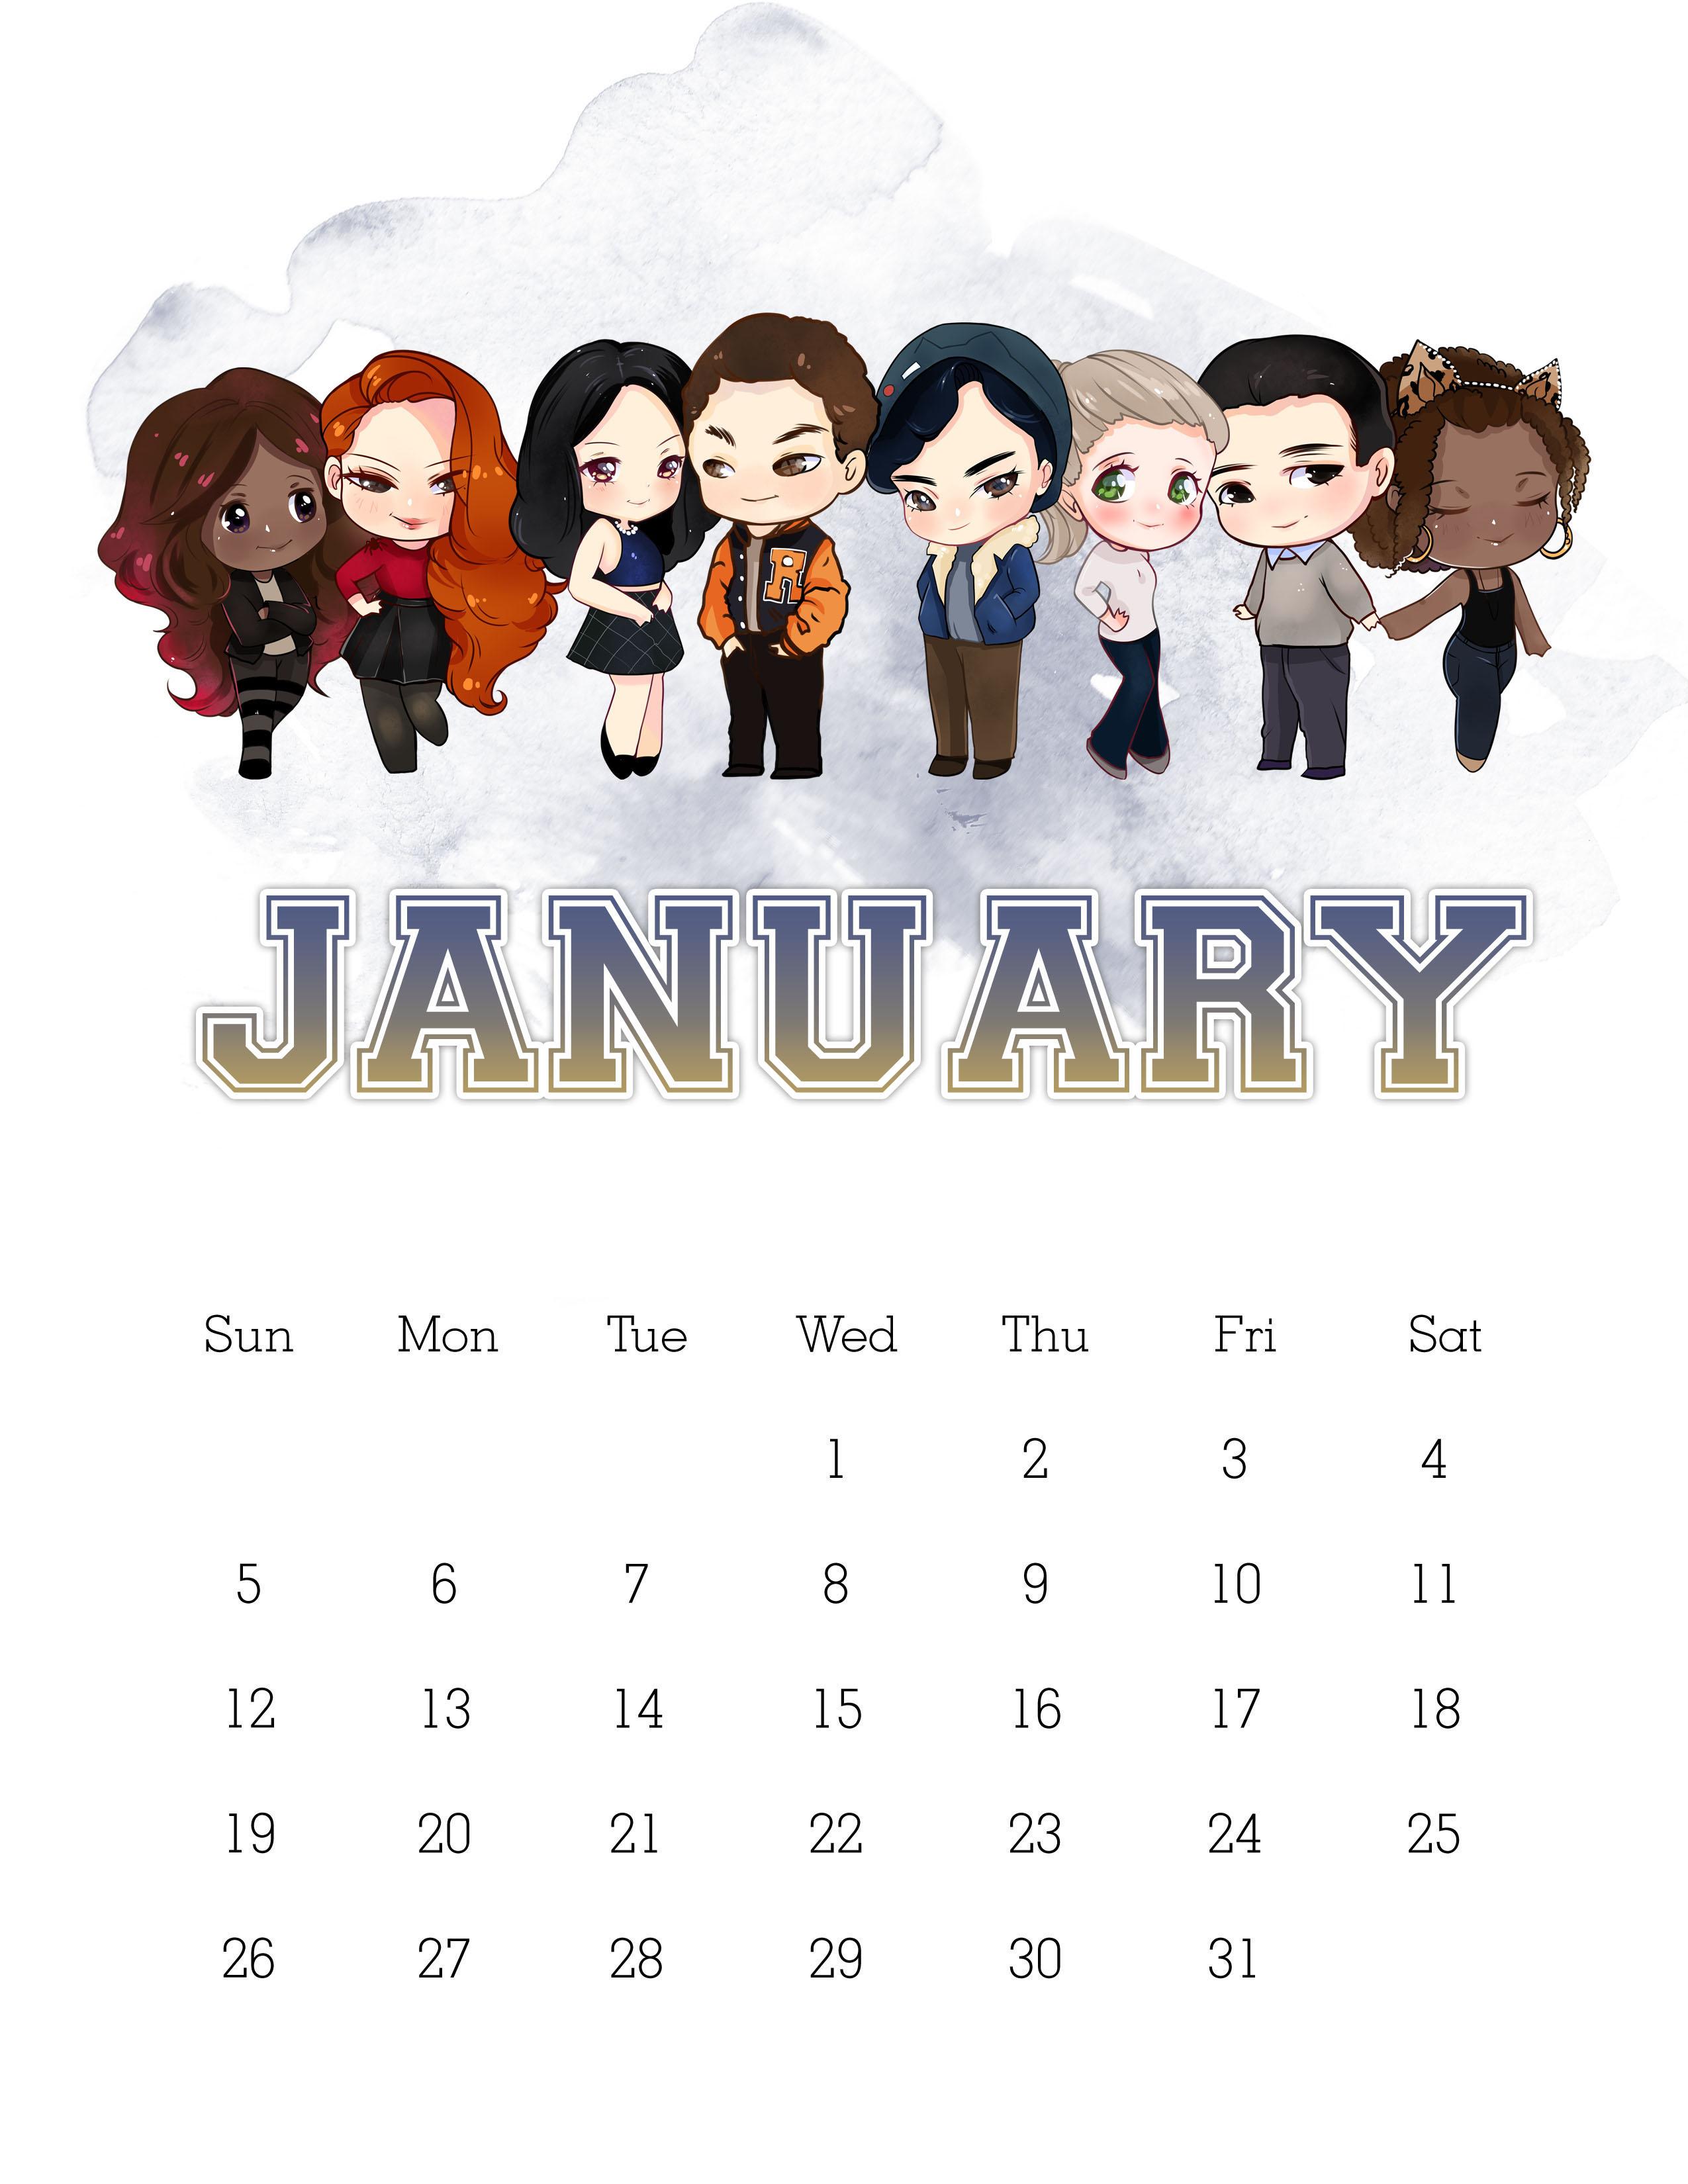 Free Printable 2020 Riverdale Calendar  The Cottage Market with Printable Disney Calendar 2020